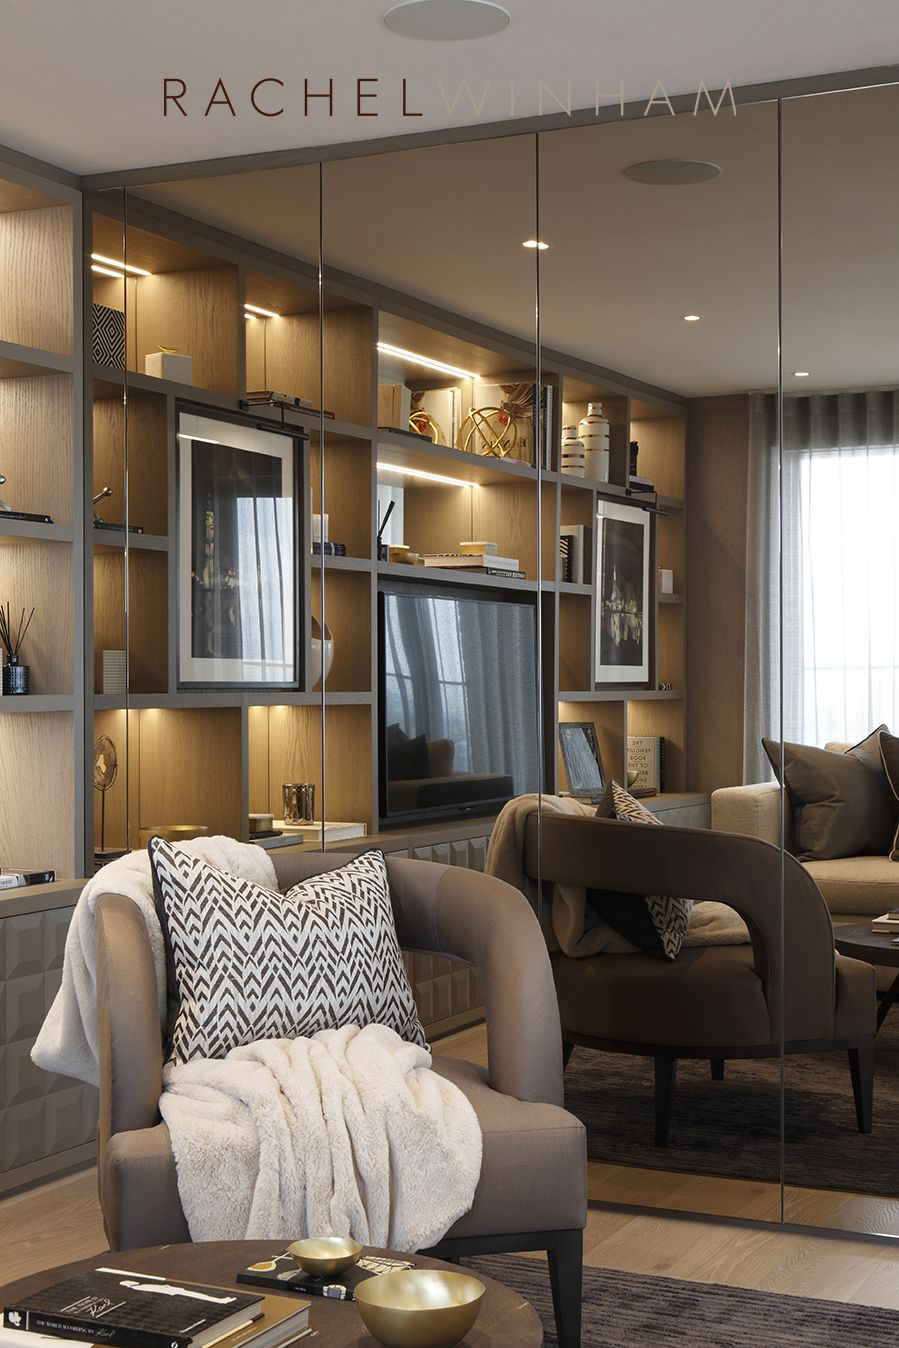 living room rachel winham interior design id for the home wohnen rh pinterest com